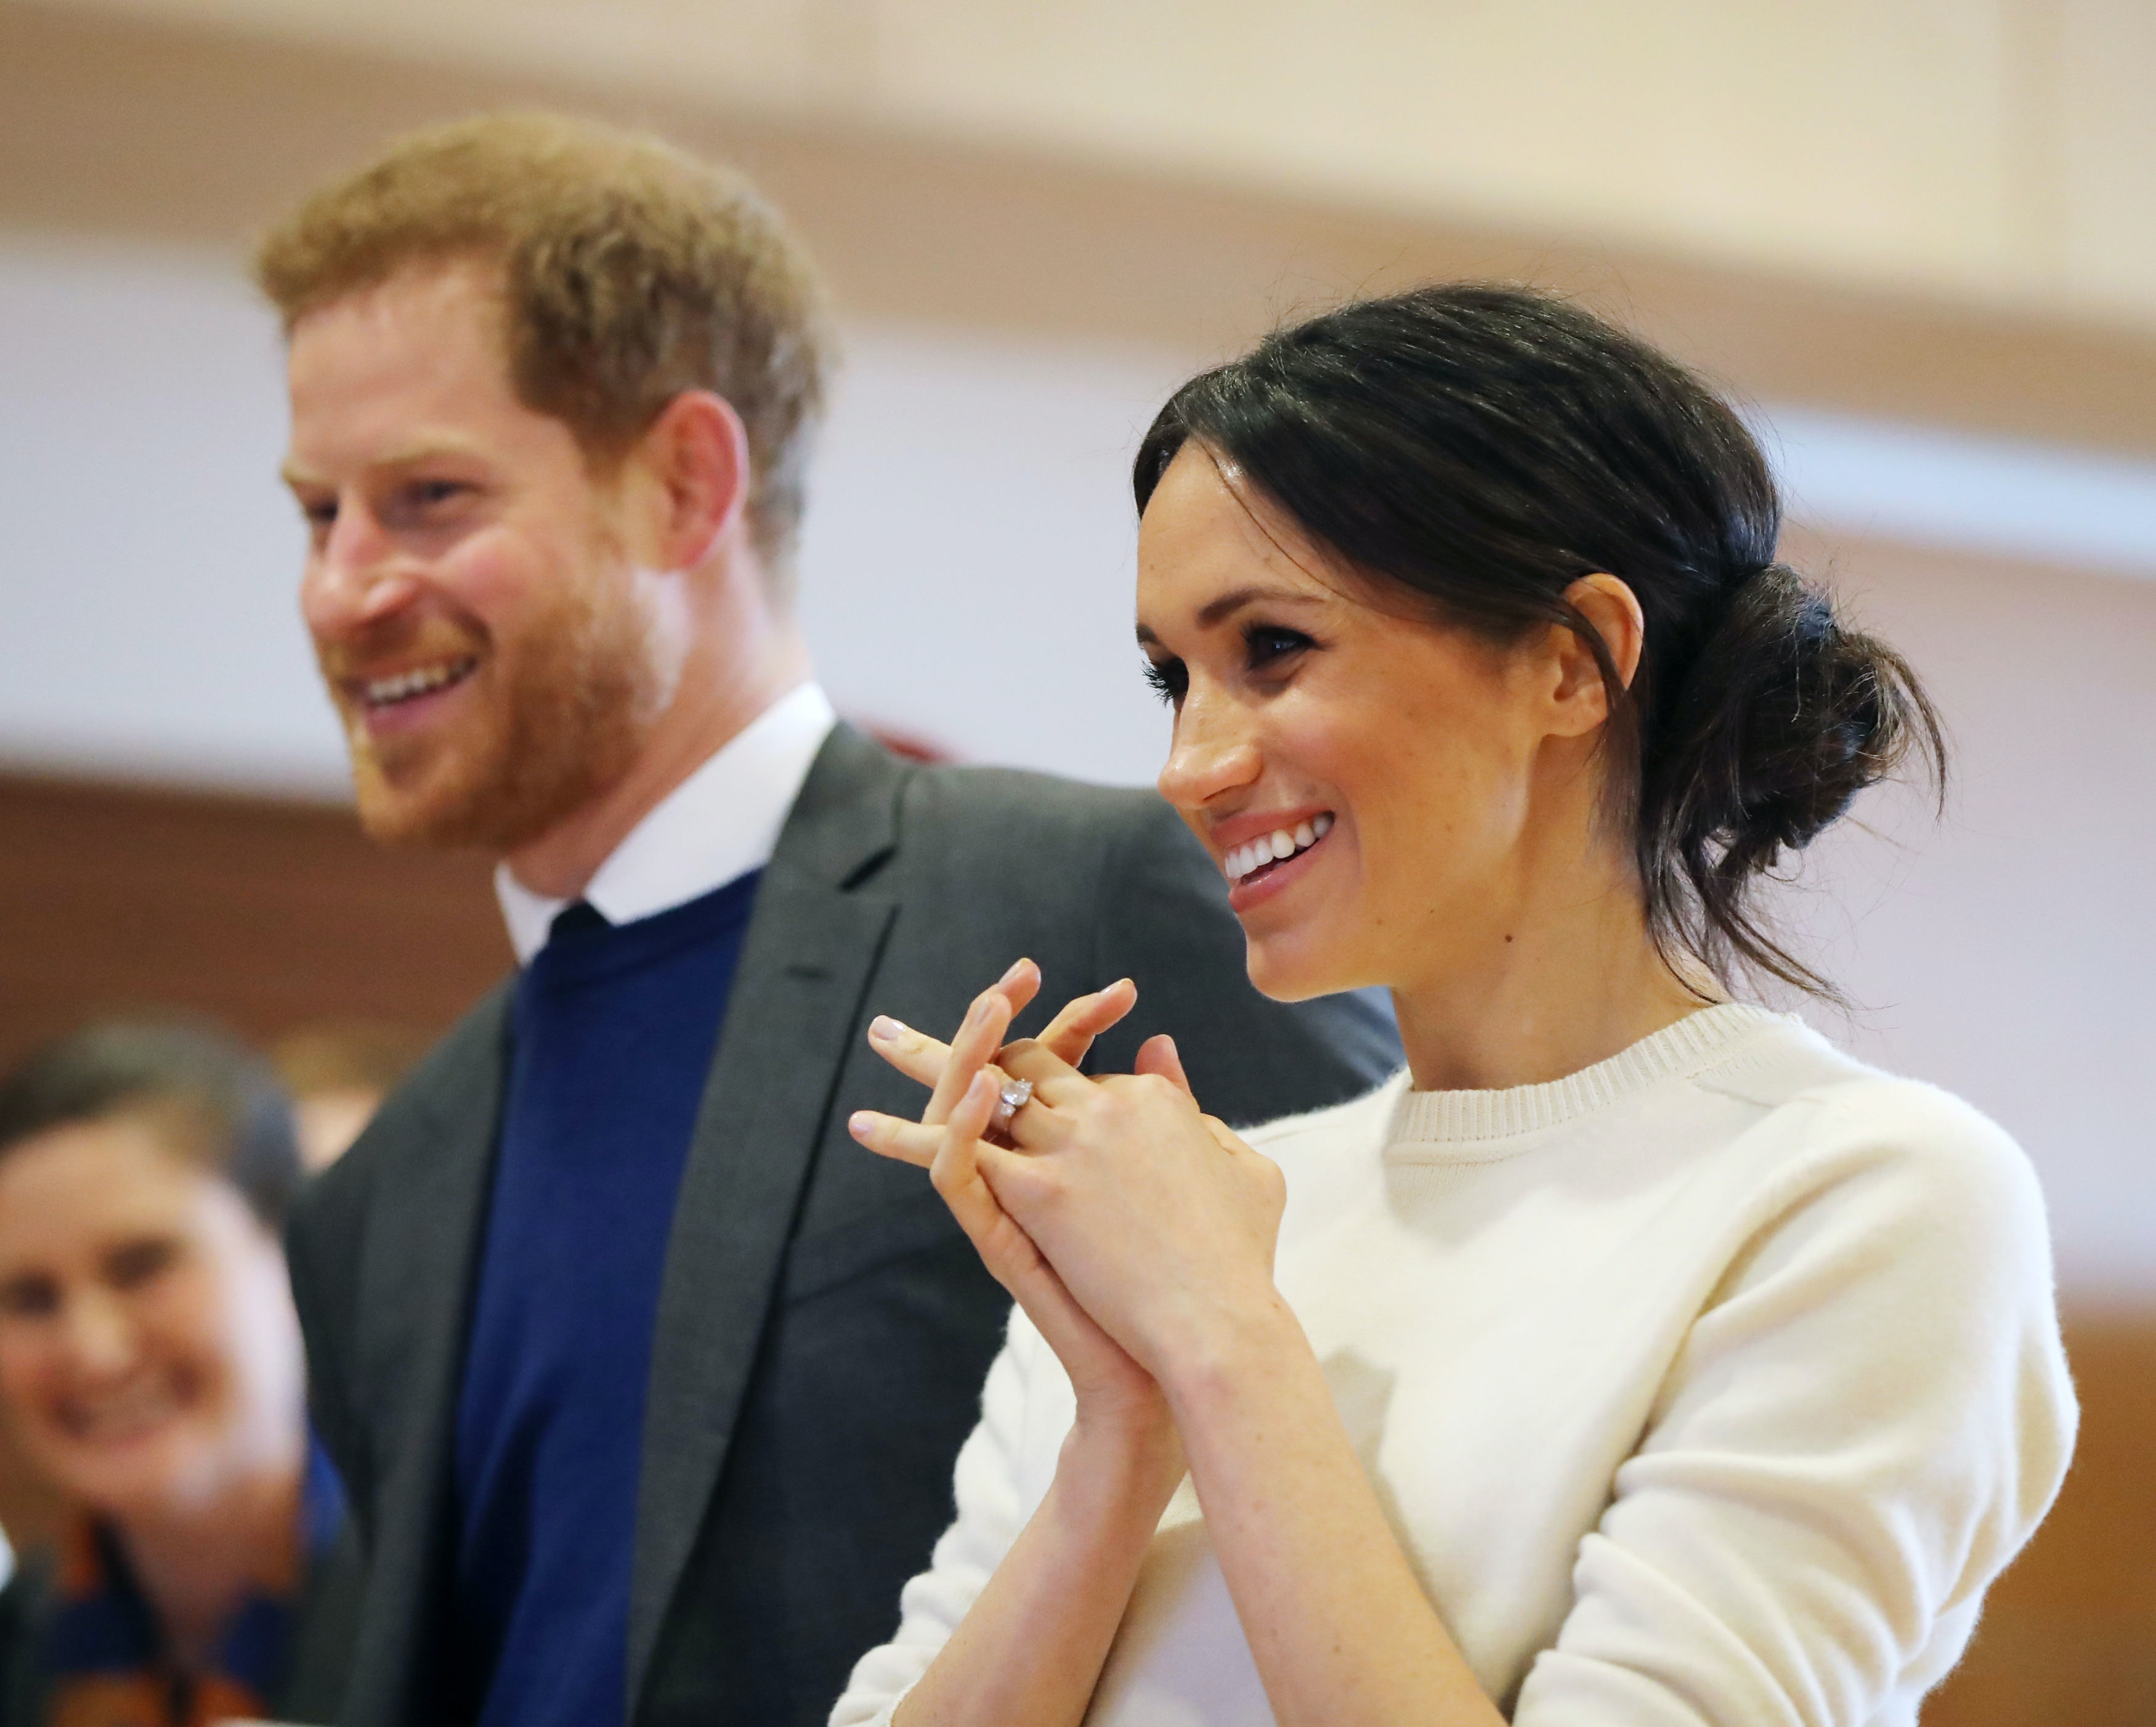 When Is Prince Harry S Wedding.Meghan Markle Prince Harry S Wedding Date Falls On A Very Creepy